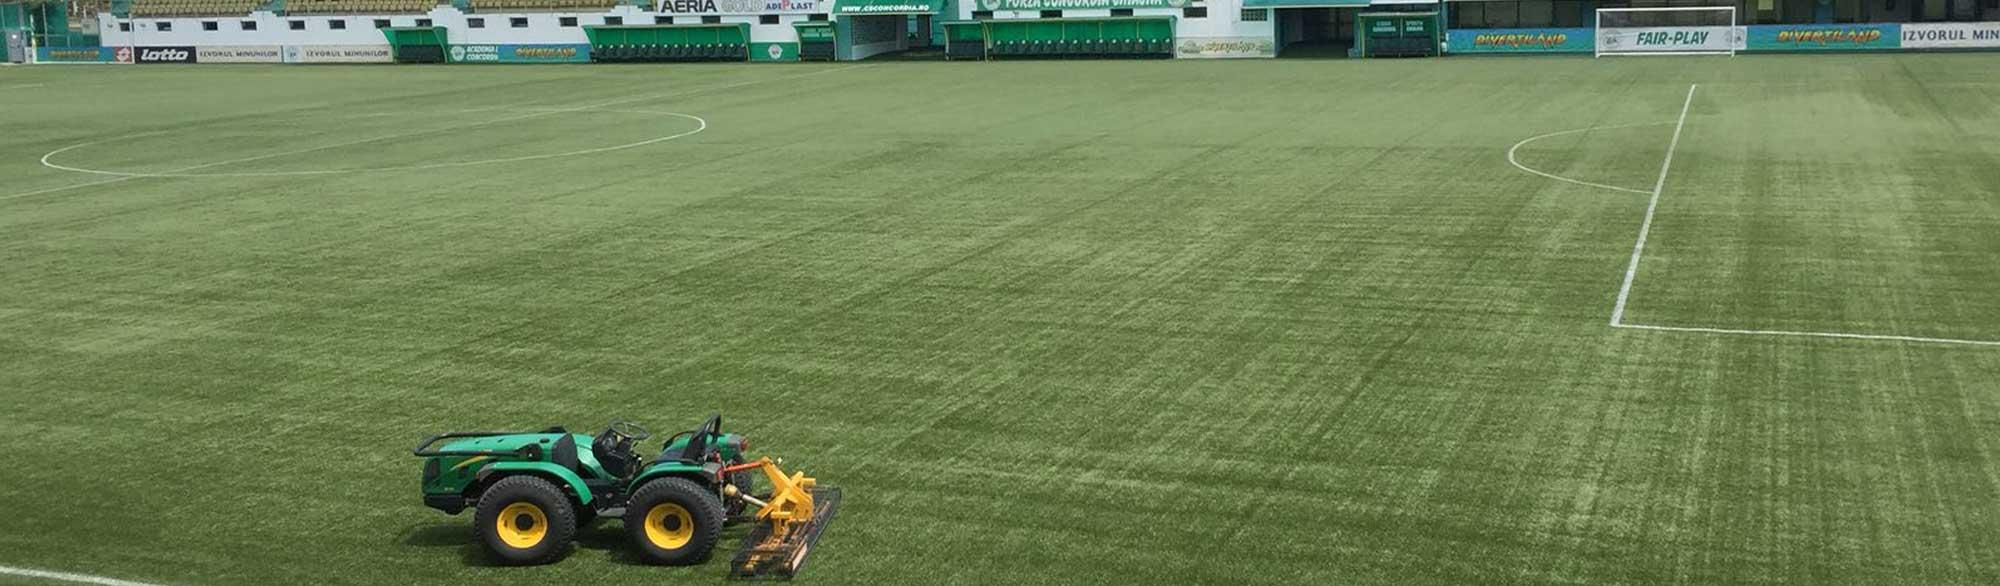 Slide gazon artificial teren fotbal